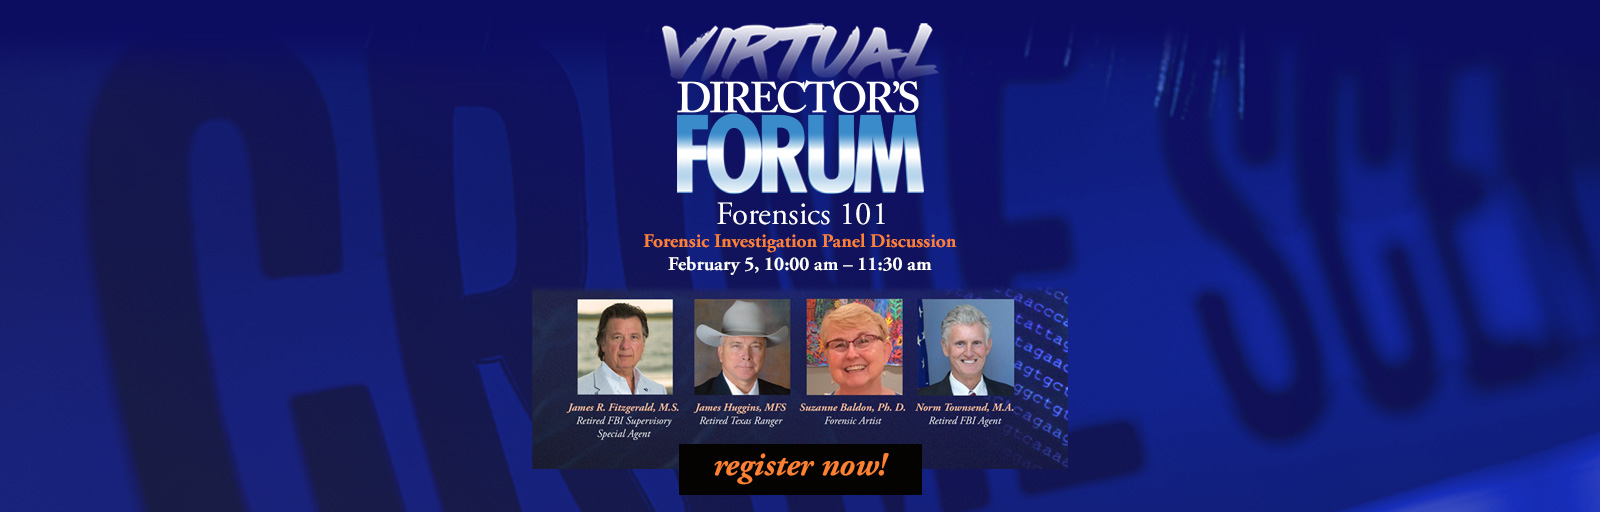 2021directorsforum-slider3